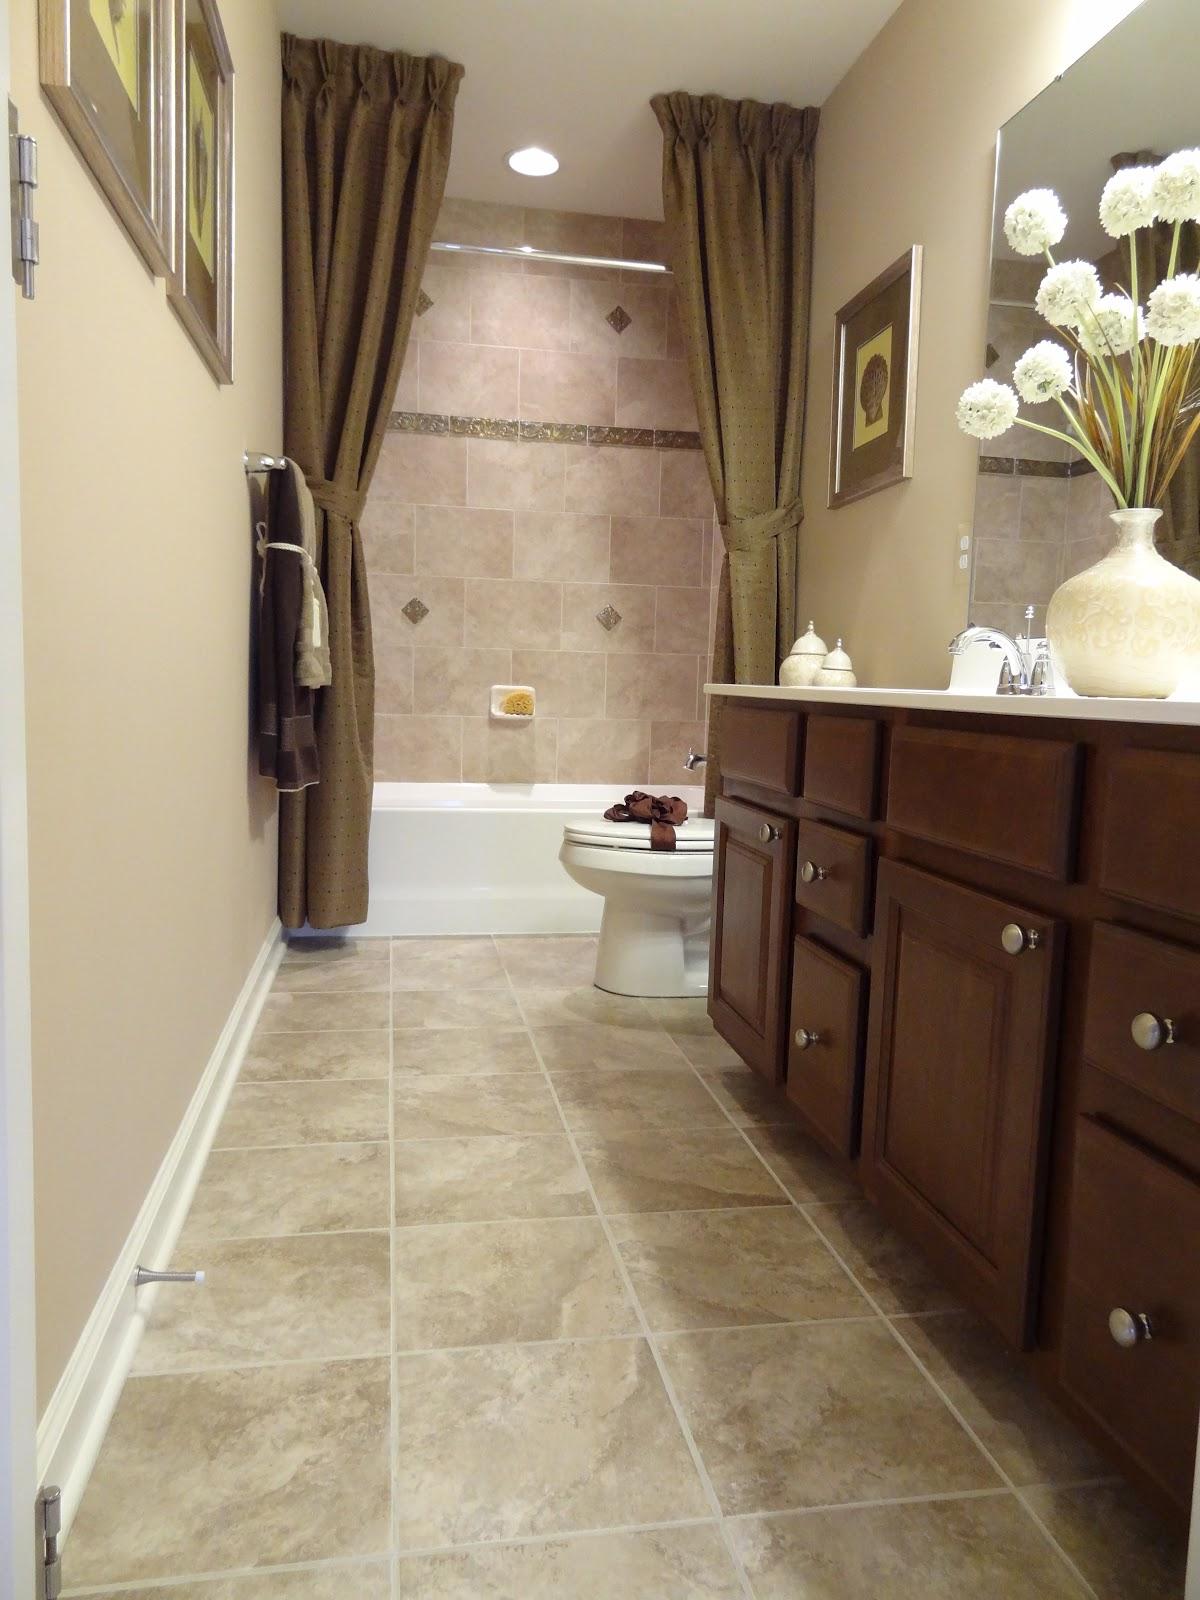 Lot 106 model - Small bathroom ideas with tub ...